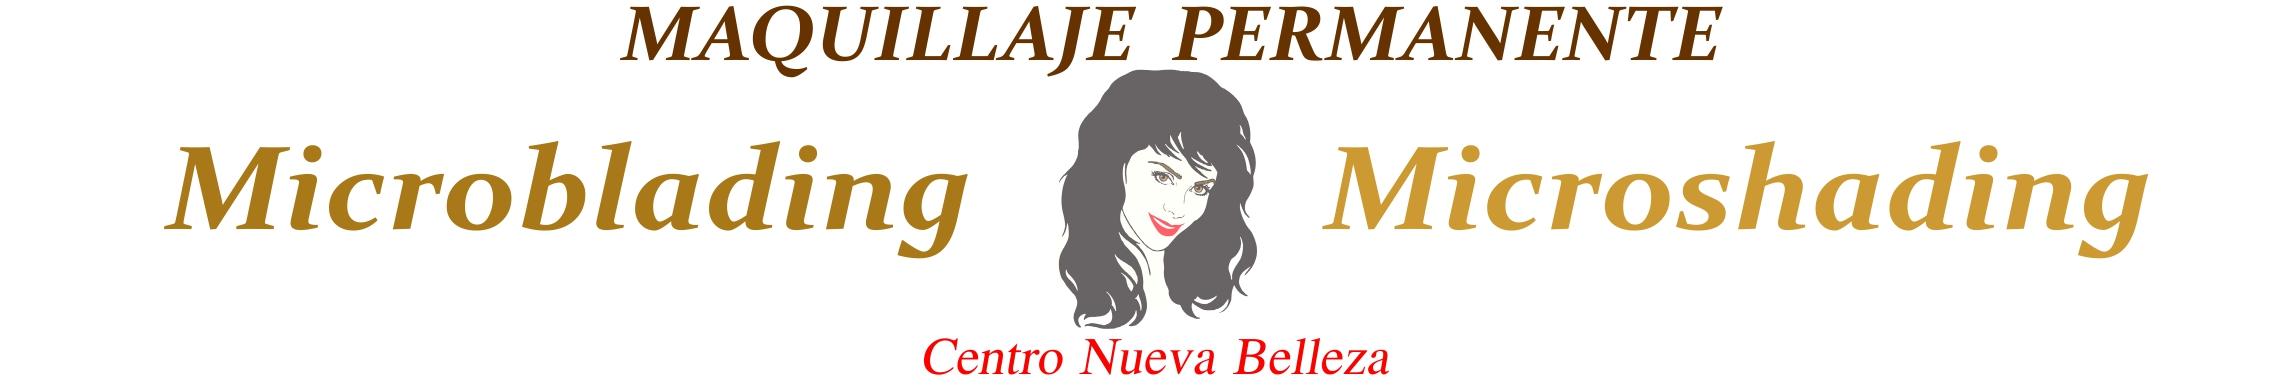 Maquillaje Permanente Logo